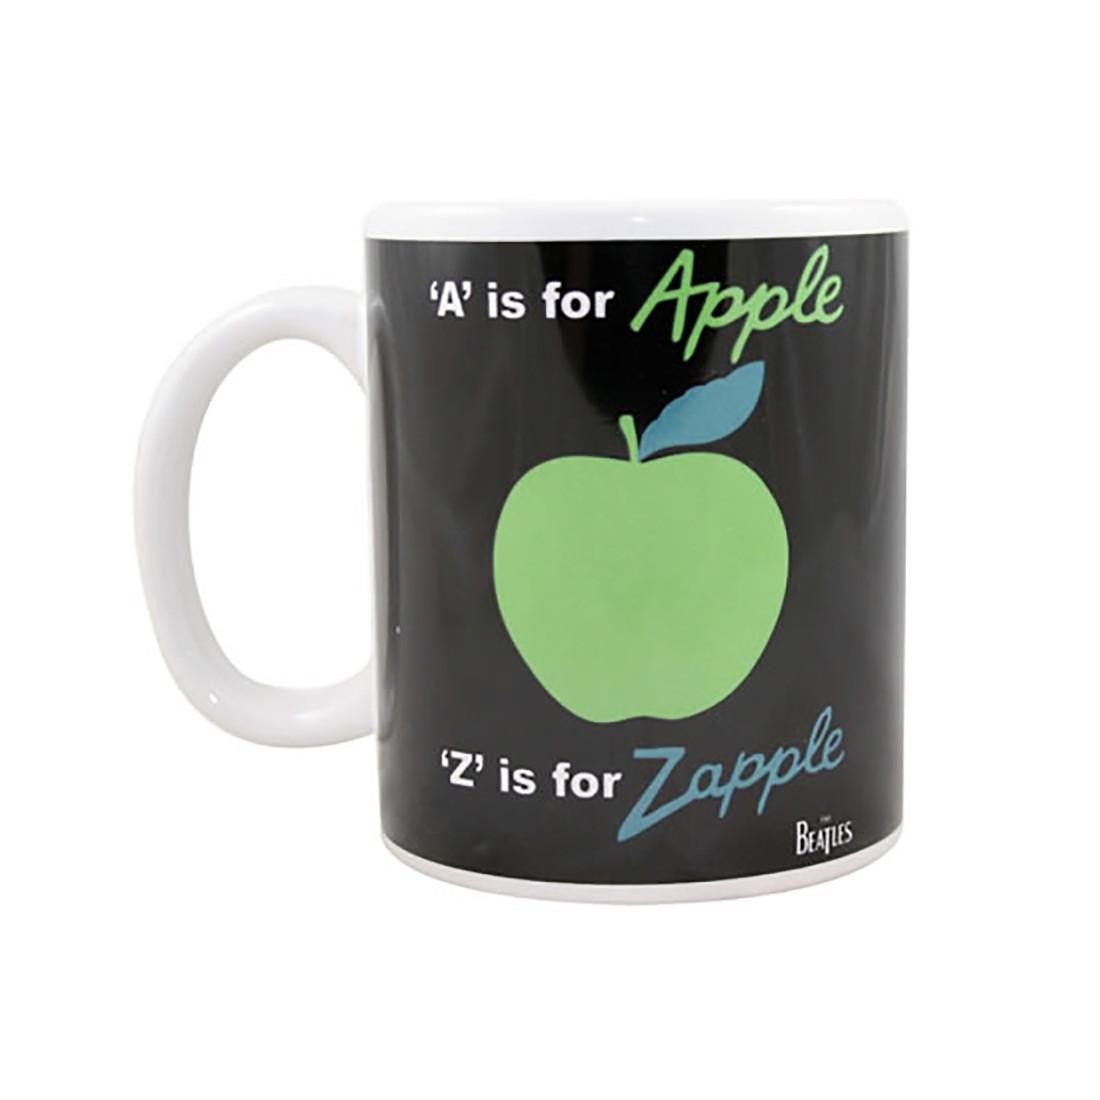 A is for Apple White Mug